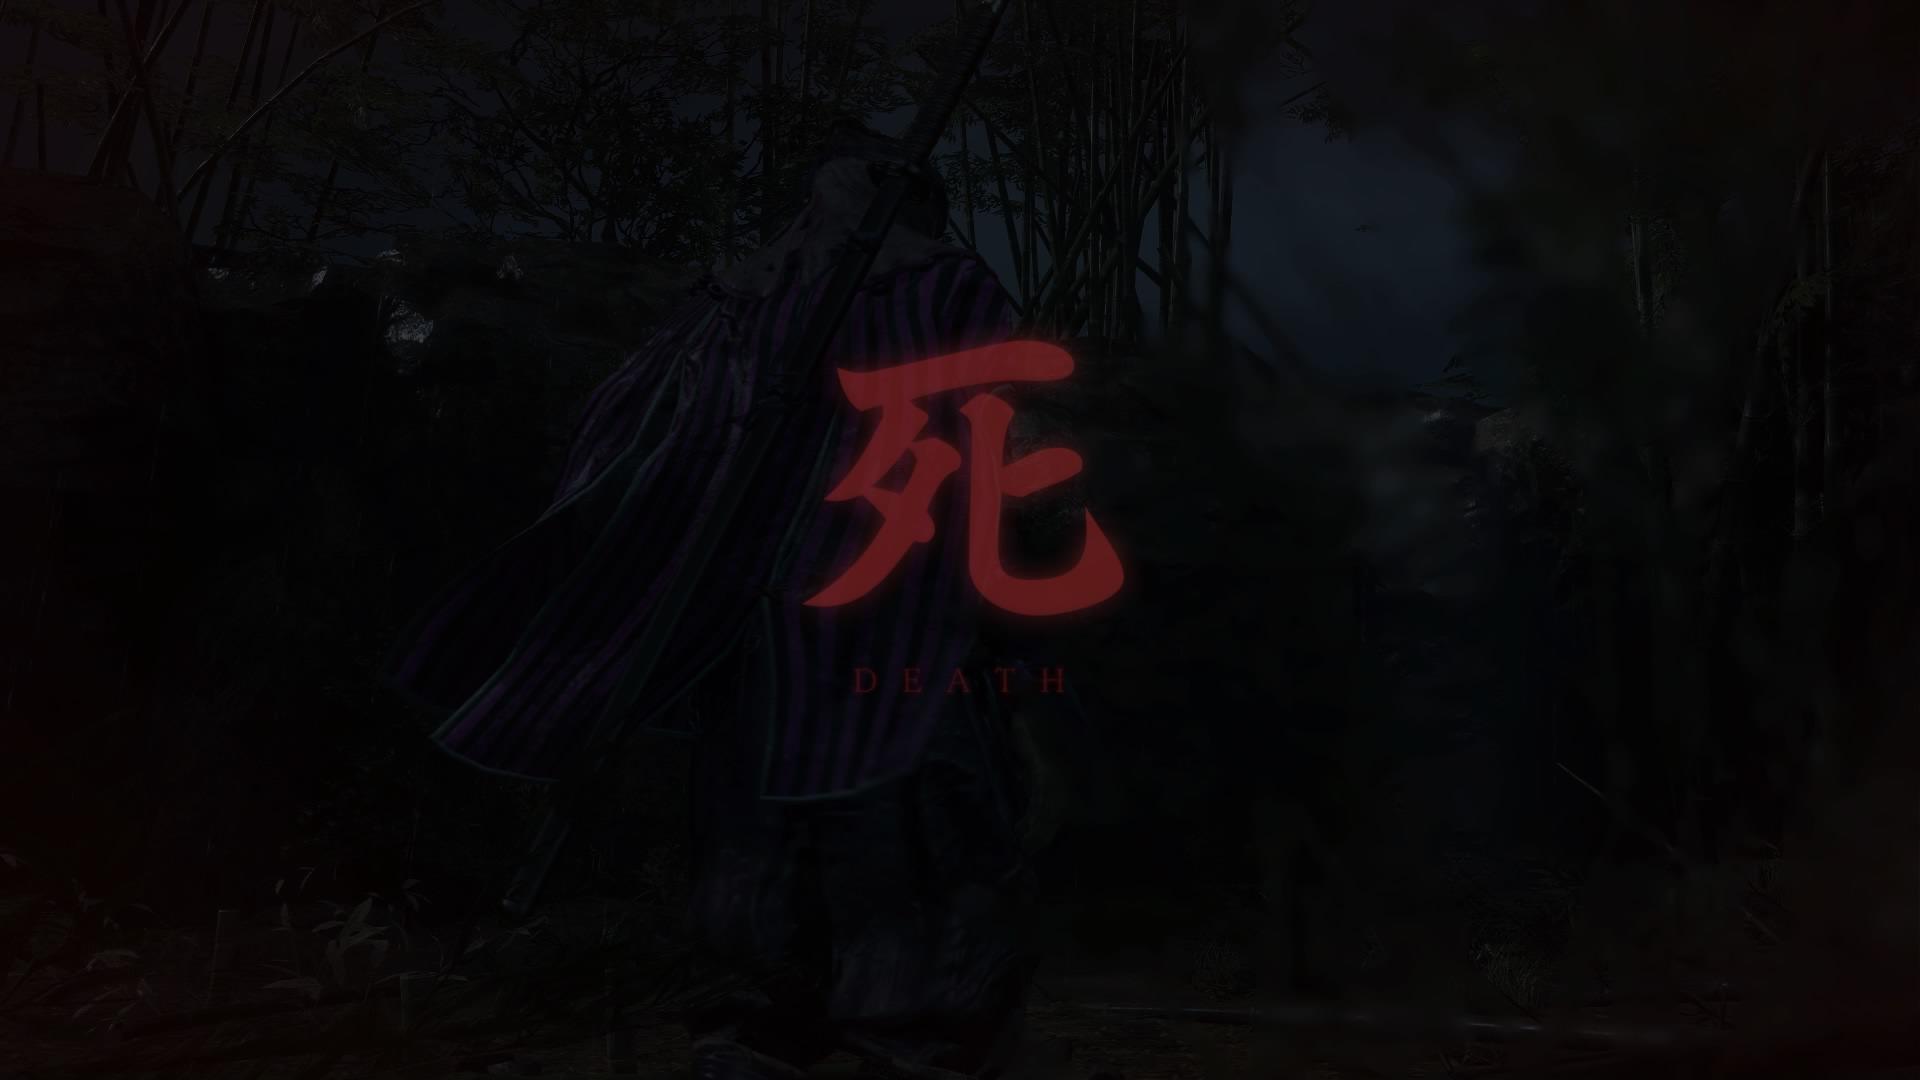 Sekiro death.jpg